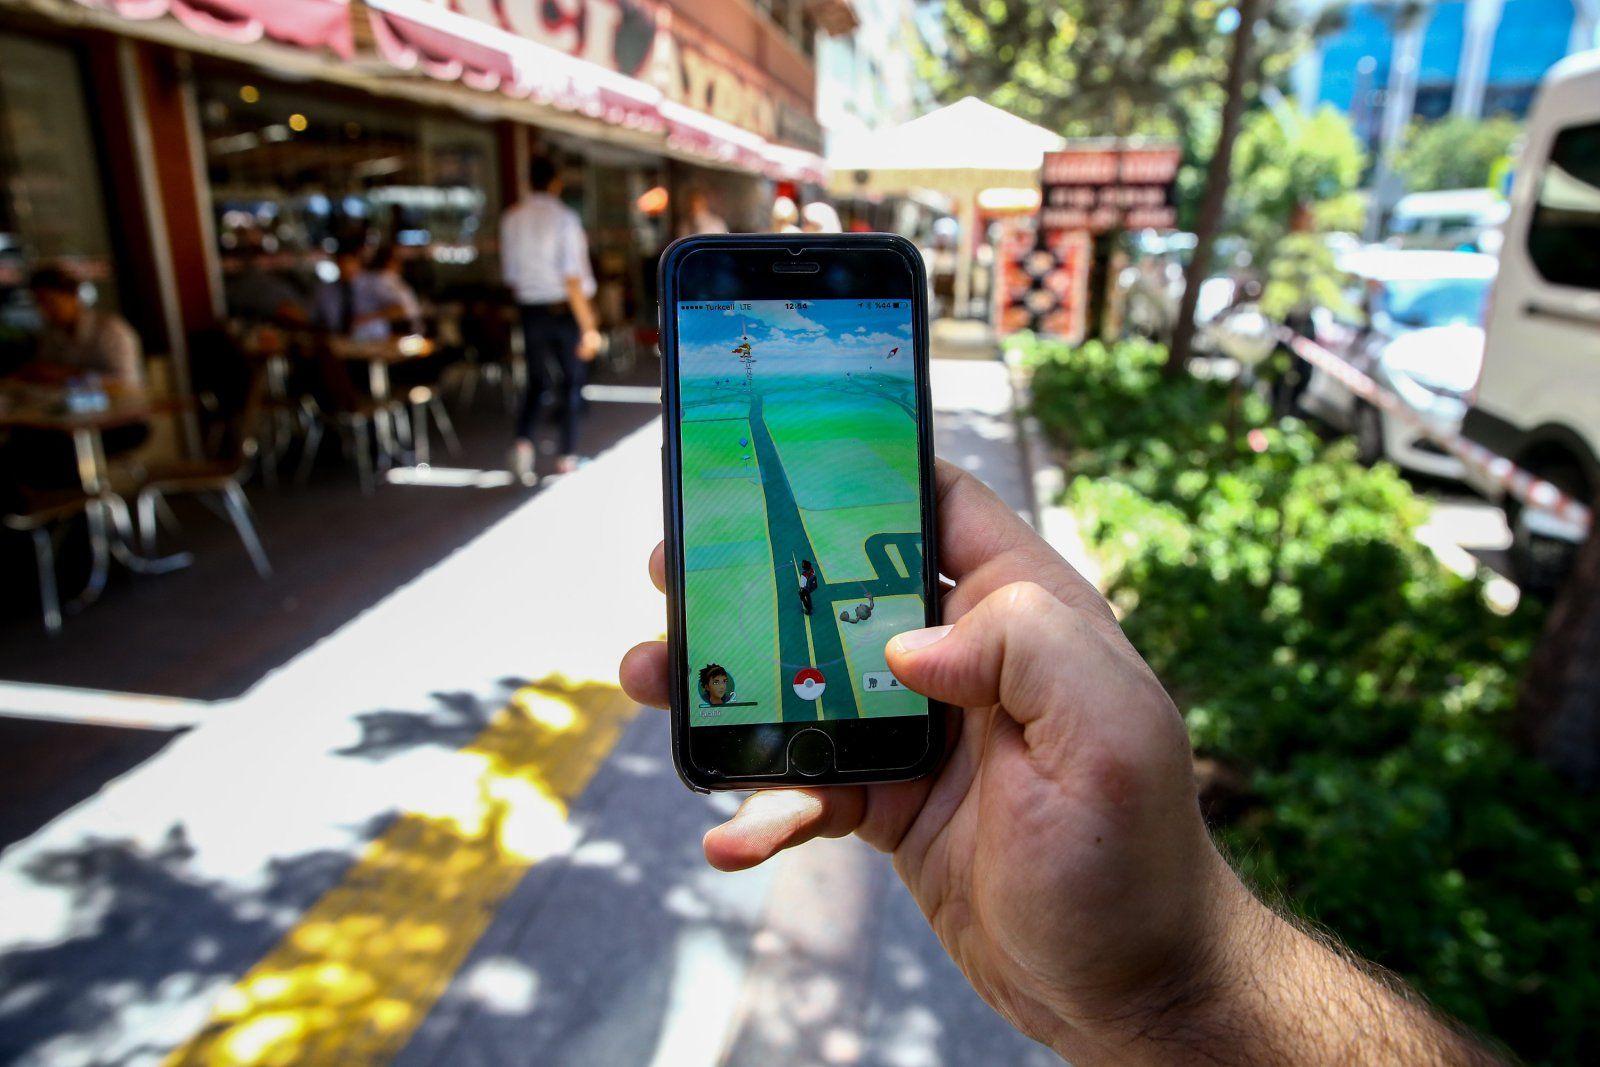 UK children's charity says 'Pokemon Go' needs more safety